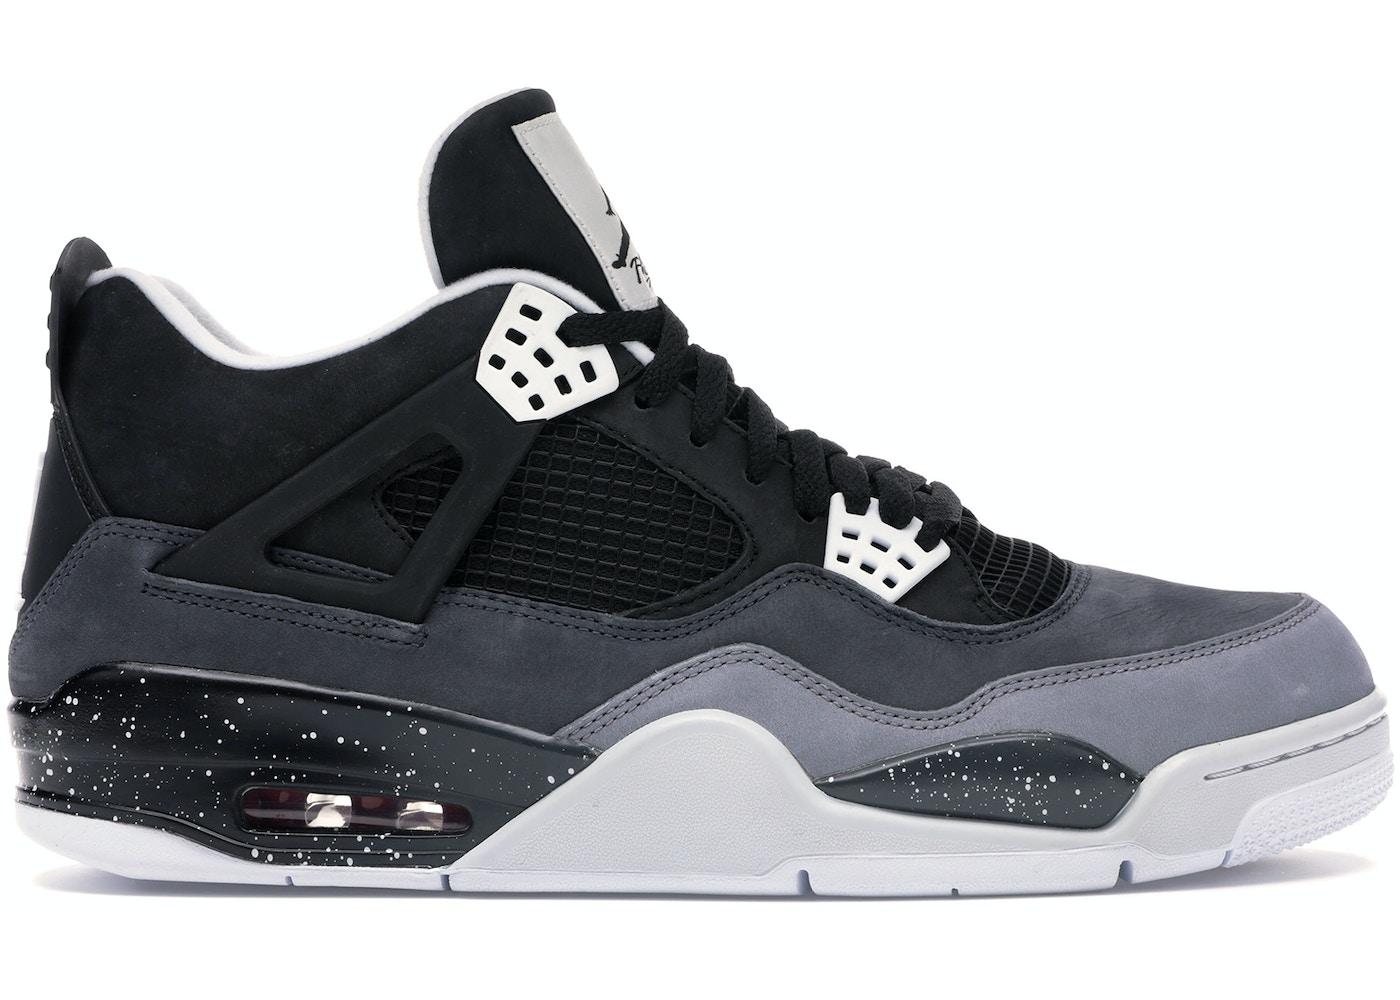 online store 552d1 34bdc Jordan 4 Retro Fear Pack